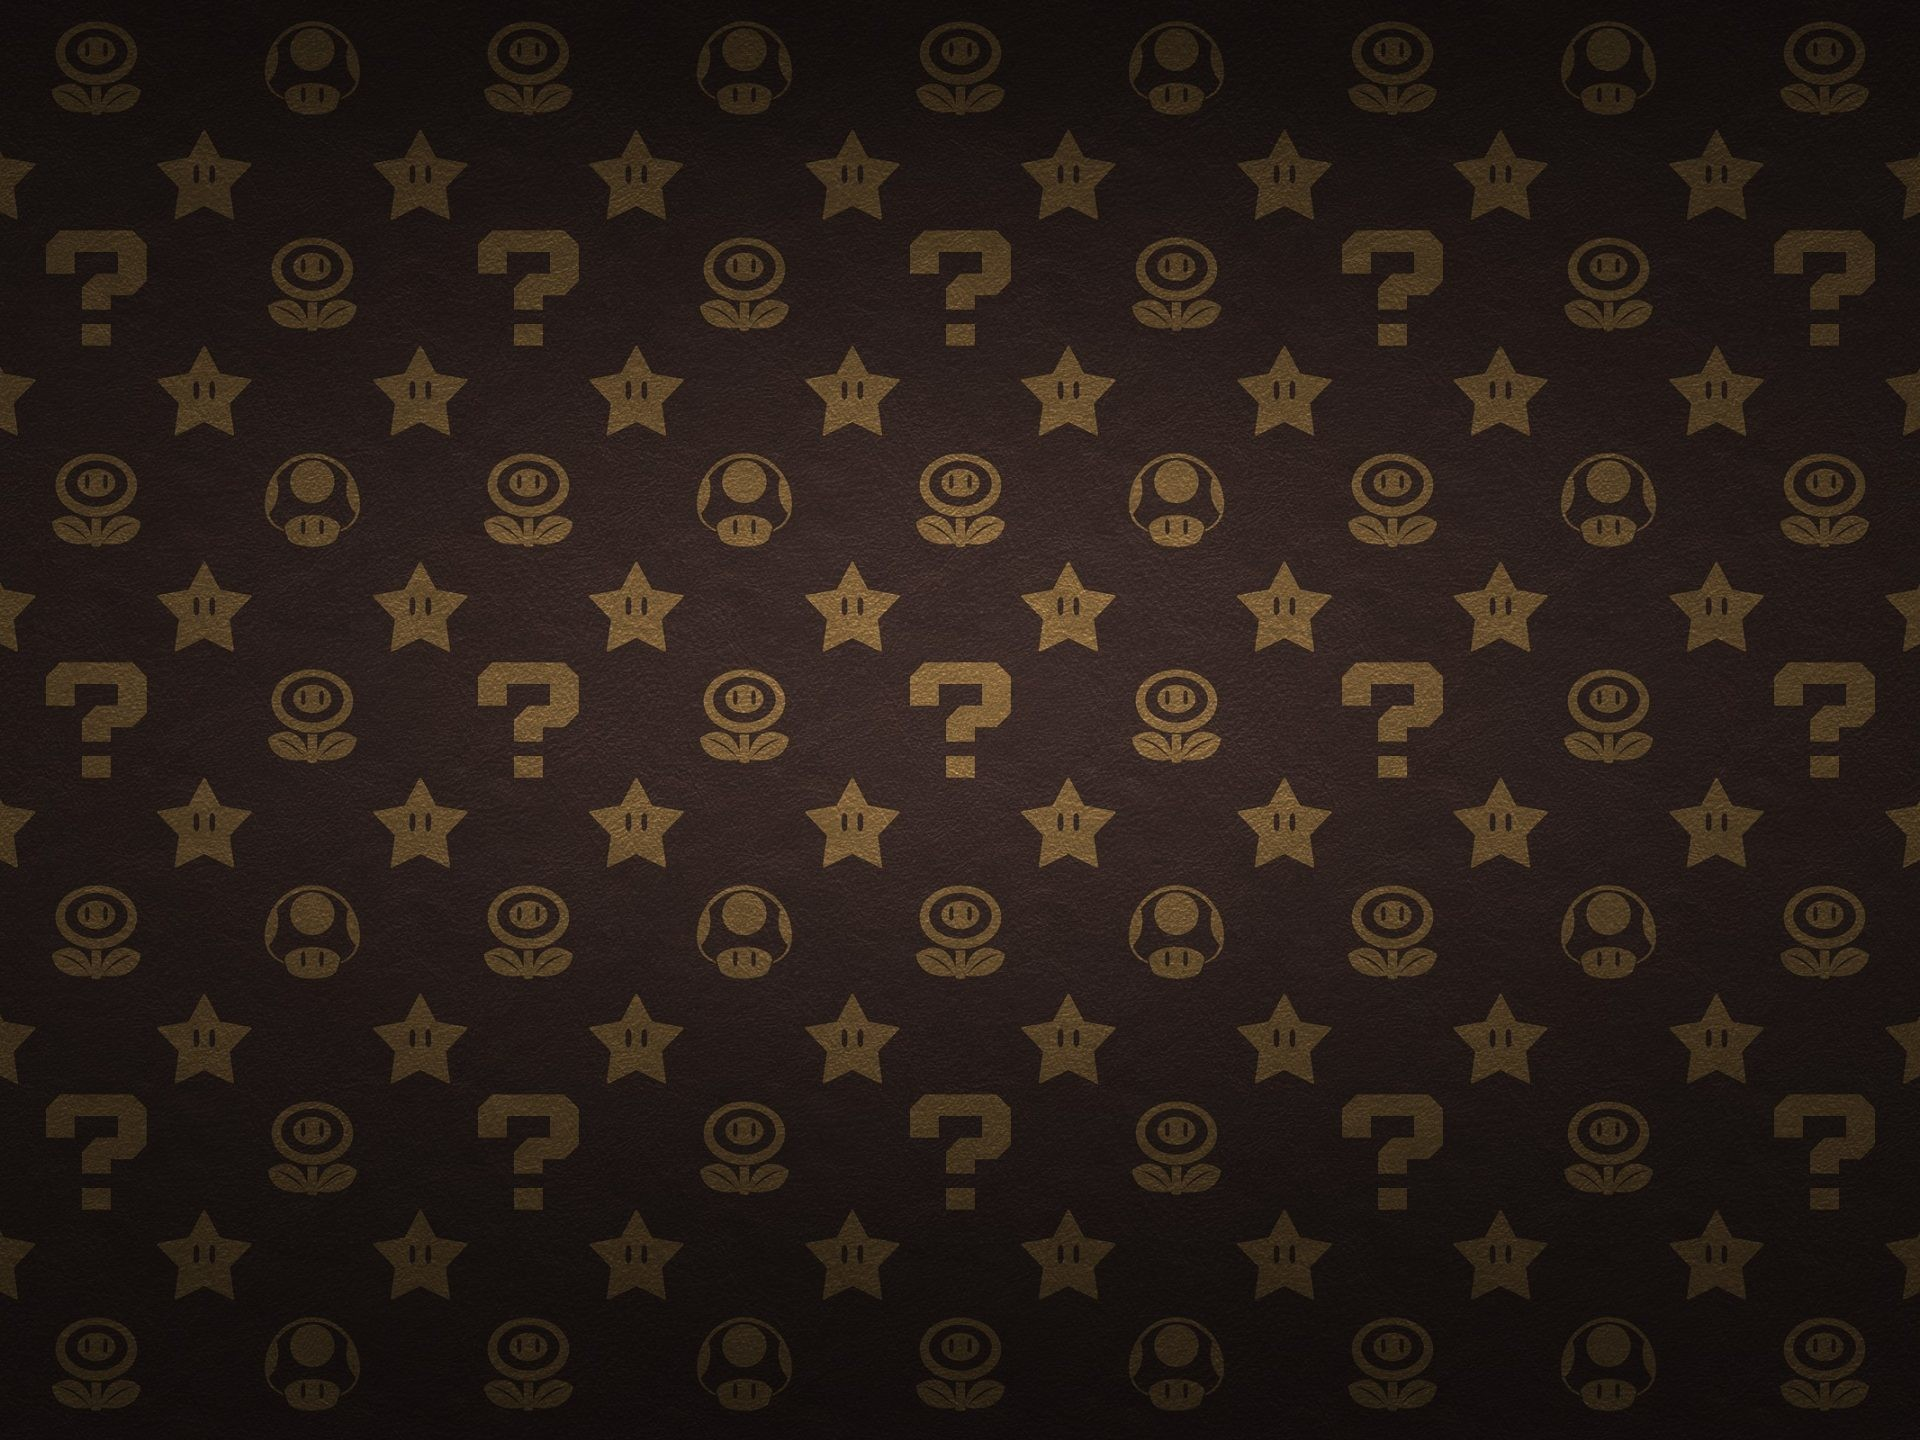 Res: 1920x1440, Flowers Stars Power Mario Bros Mushrooms High Resolution Desktop Wallpaper.  Â«Â«